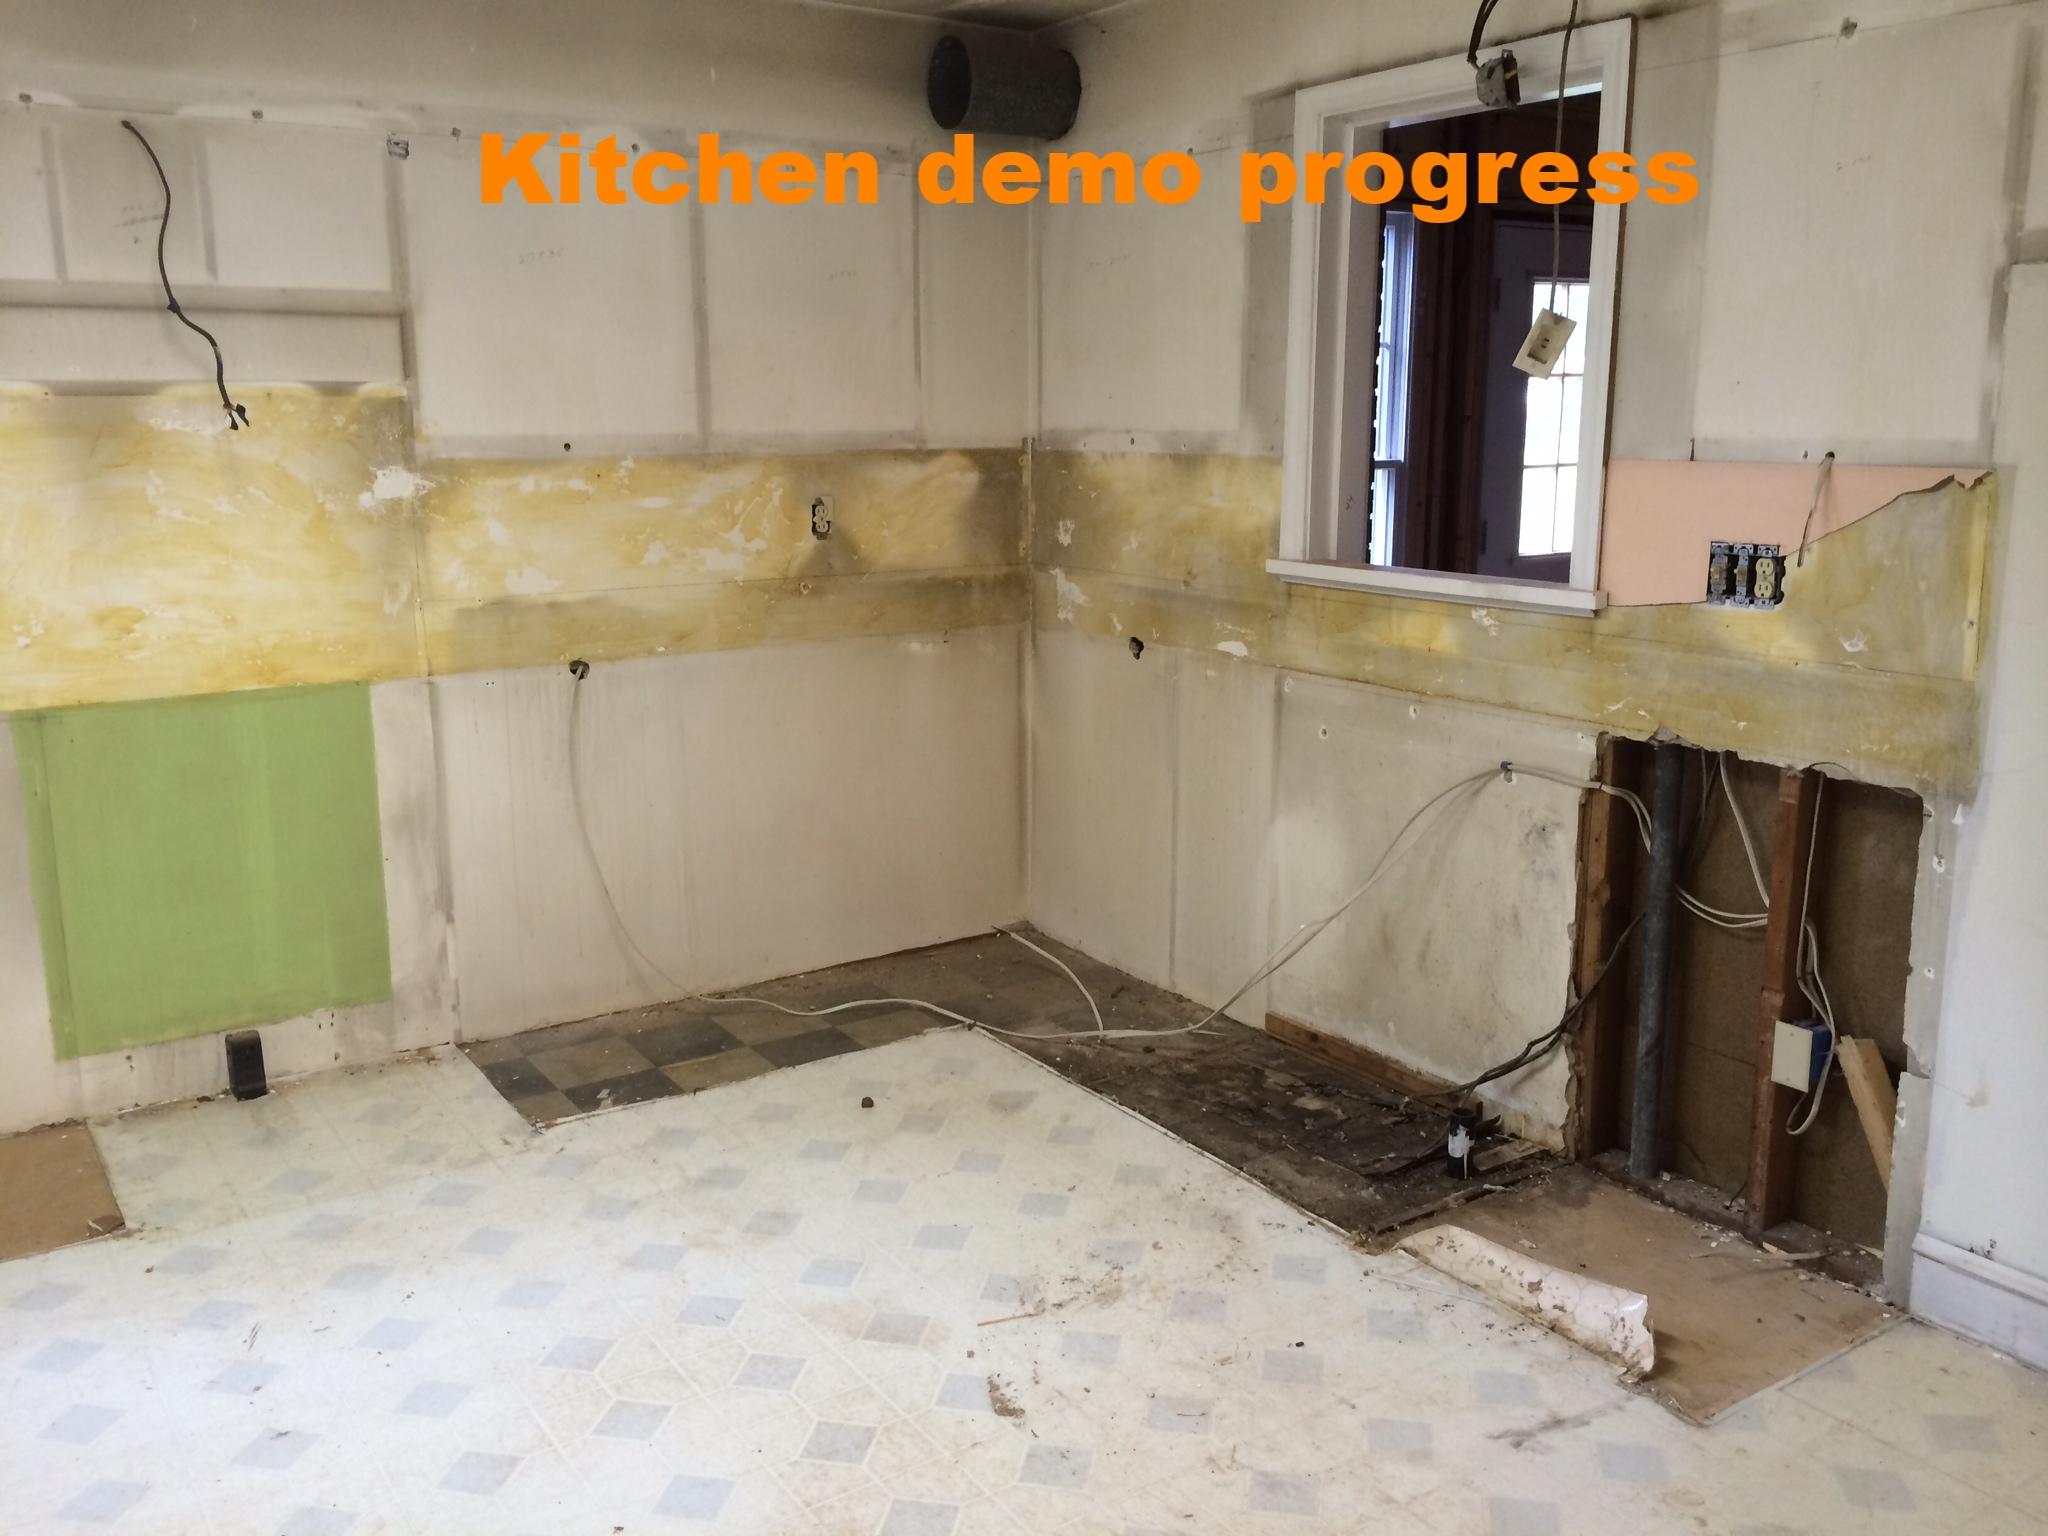 Kitchen demo progress_2.JPG